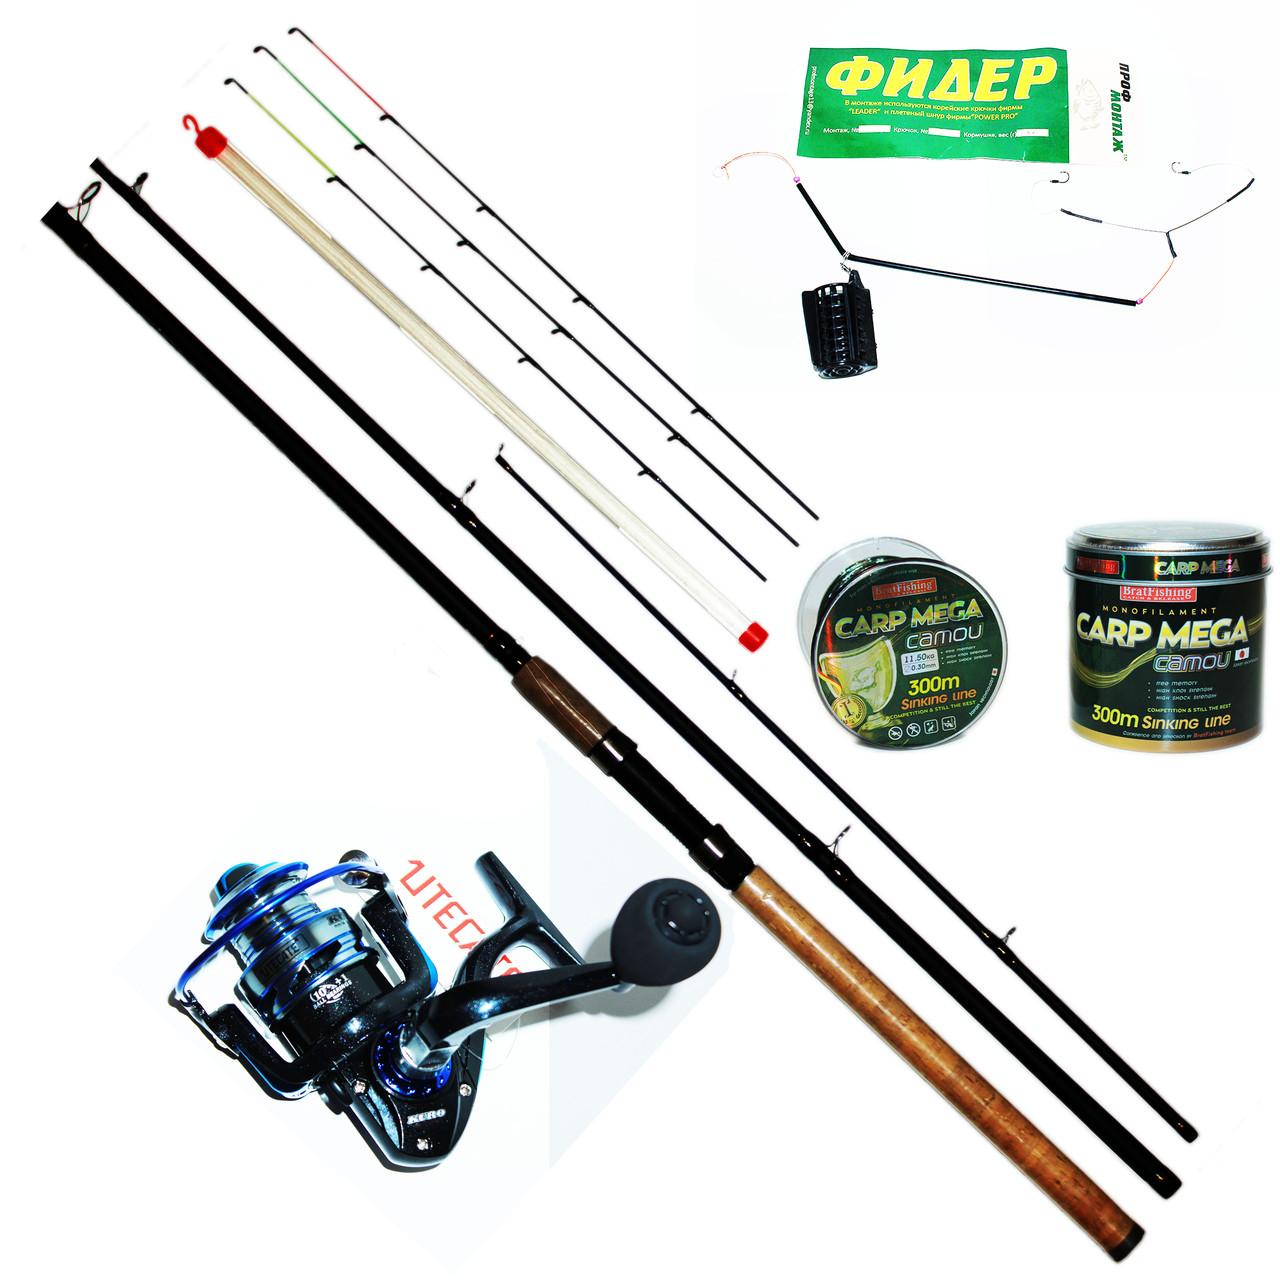 Фидерный спиннинг набор Fishing ROI 3.3 м.